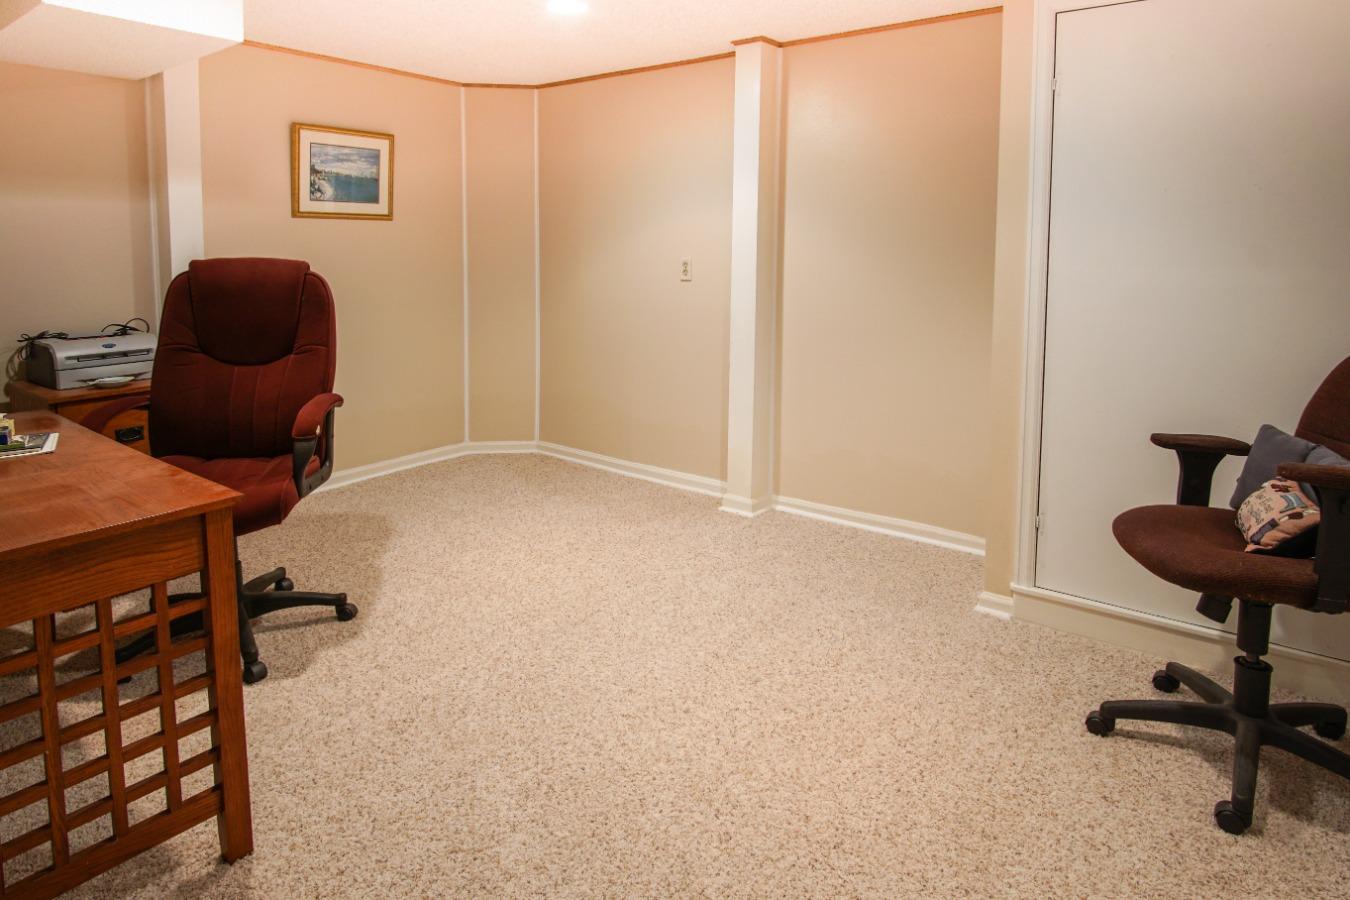 Basement office/den/playroom space